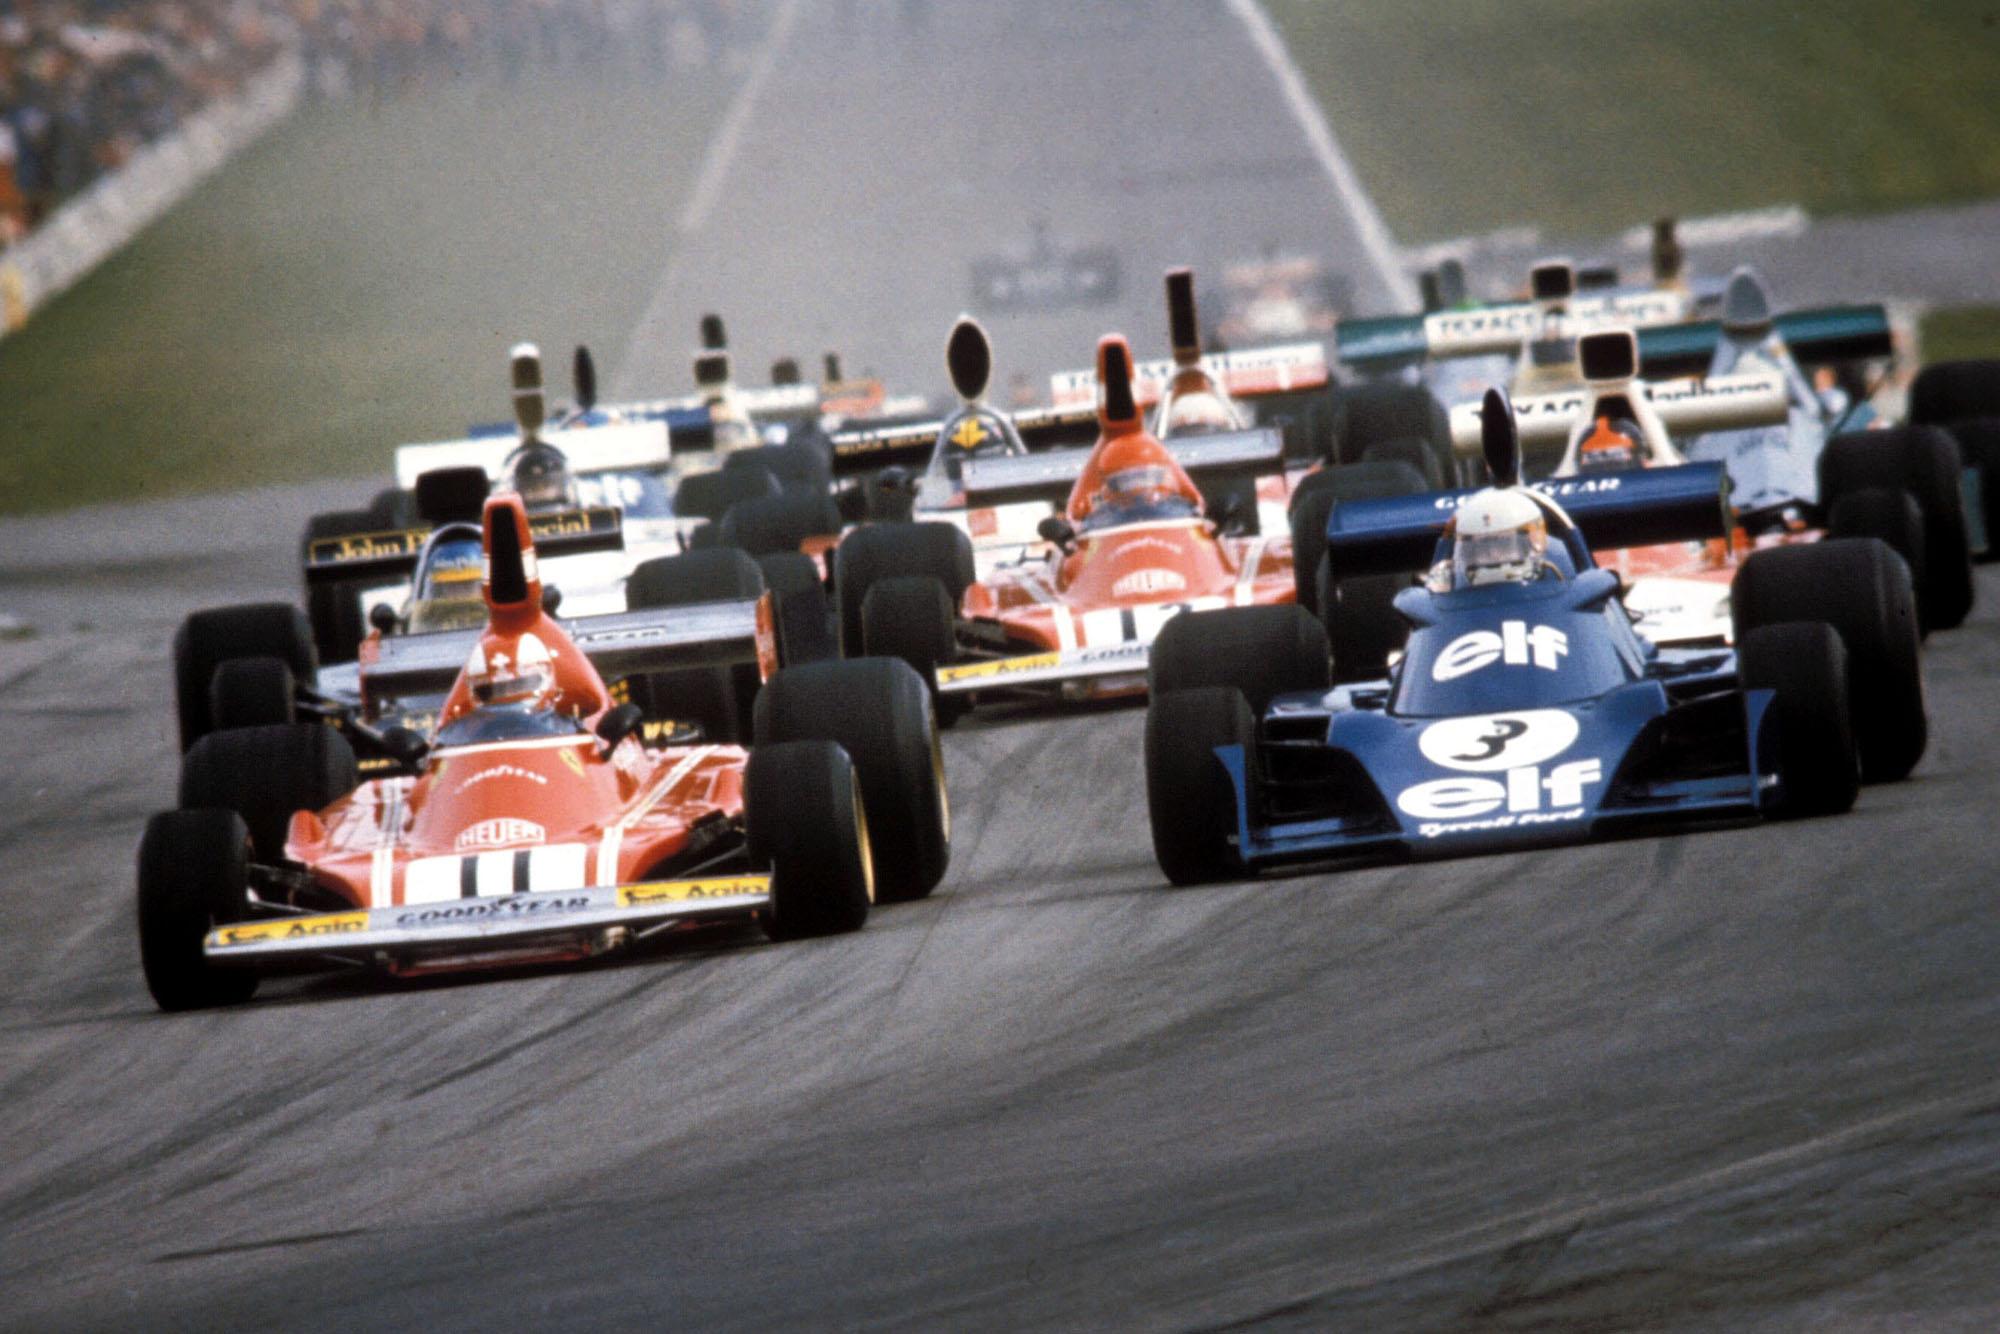 Clay Regazzoni (Ferrari) leads into the first corner of the 1974 Belgian Grand Prix, Zolder.